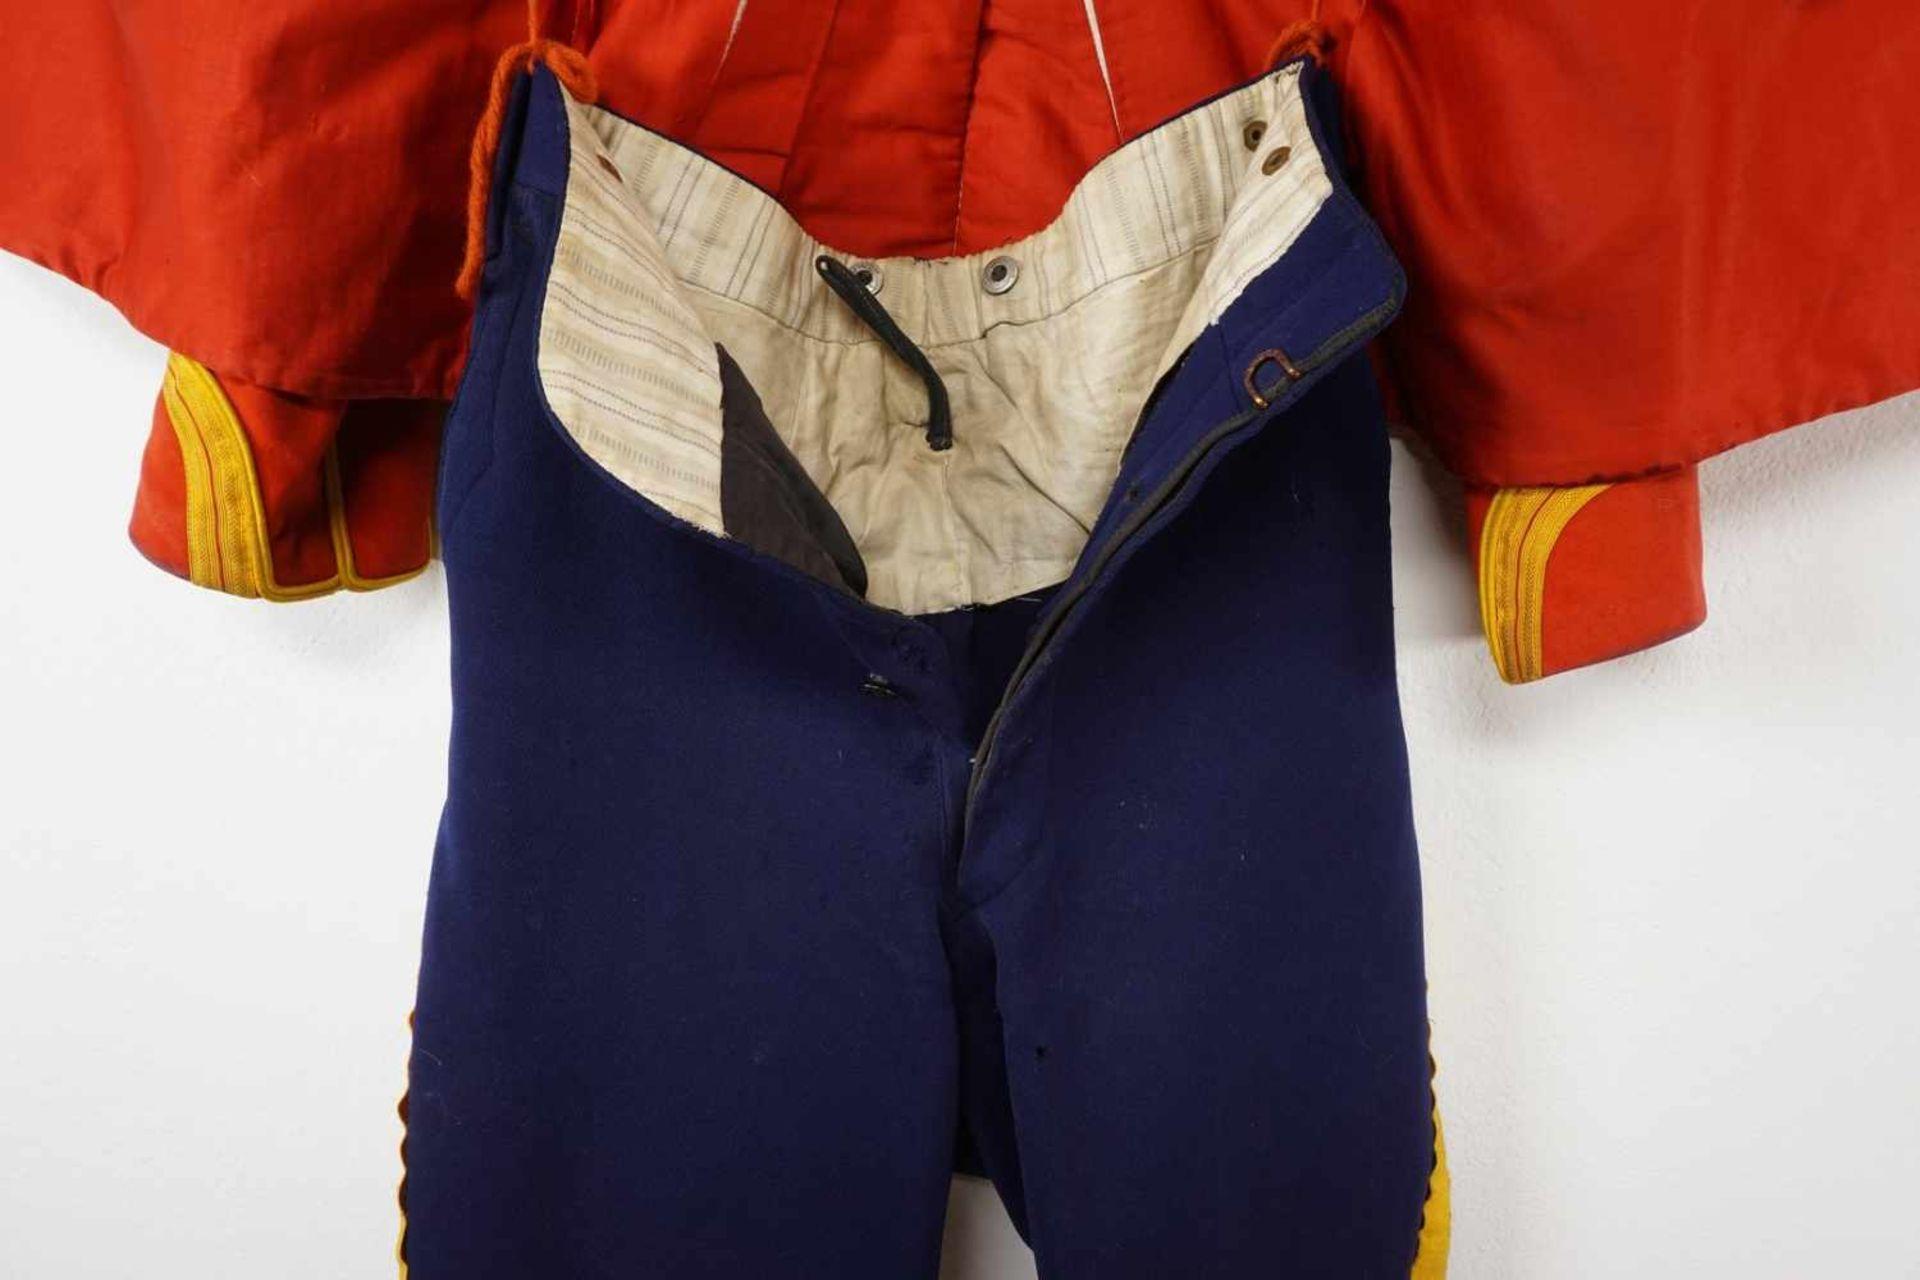 Uniform des Leib-Garde-Husaren-Regiments Potsdam, um 1900 - Bild 8 aus 9